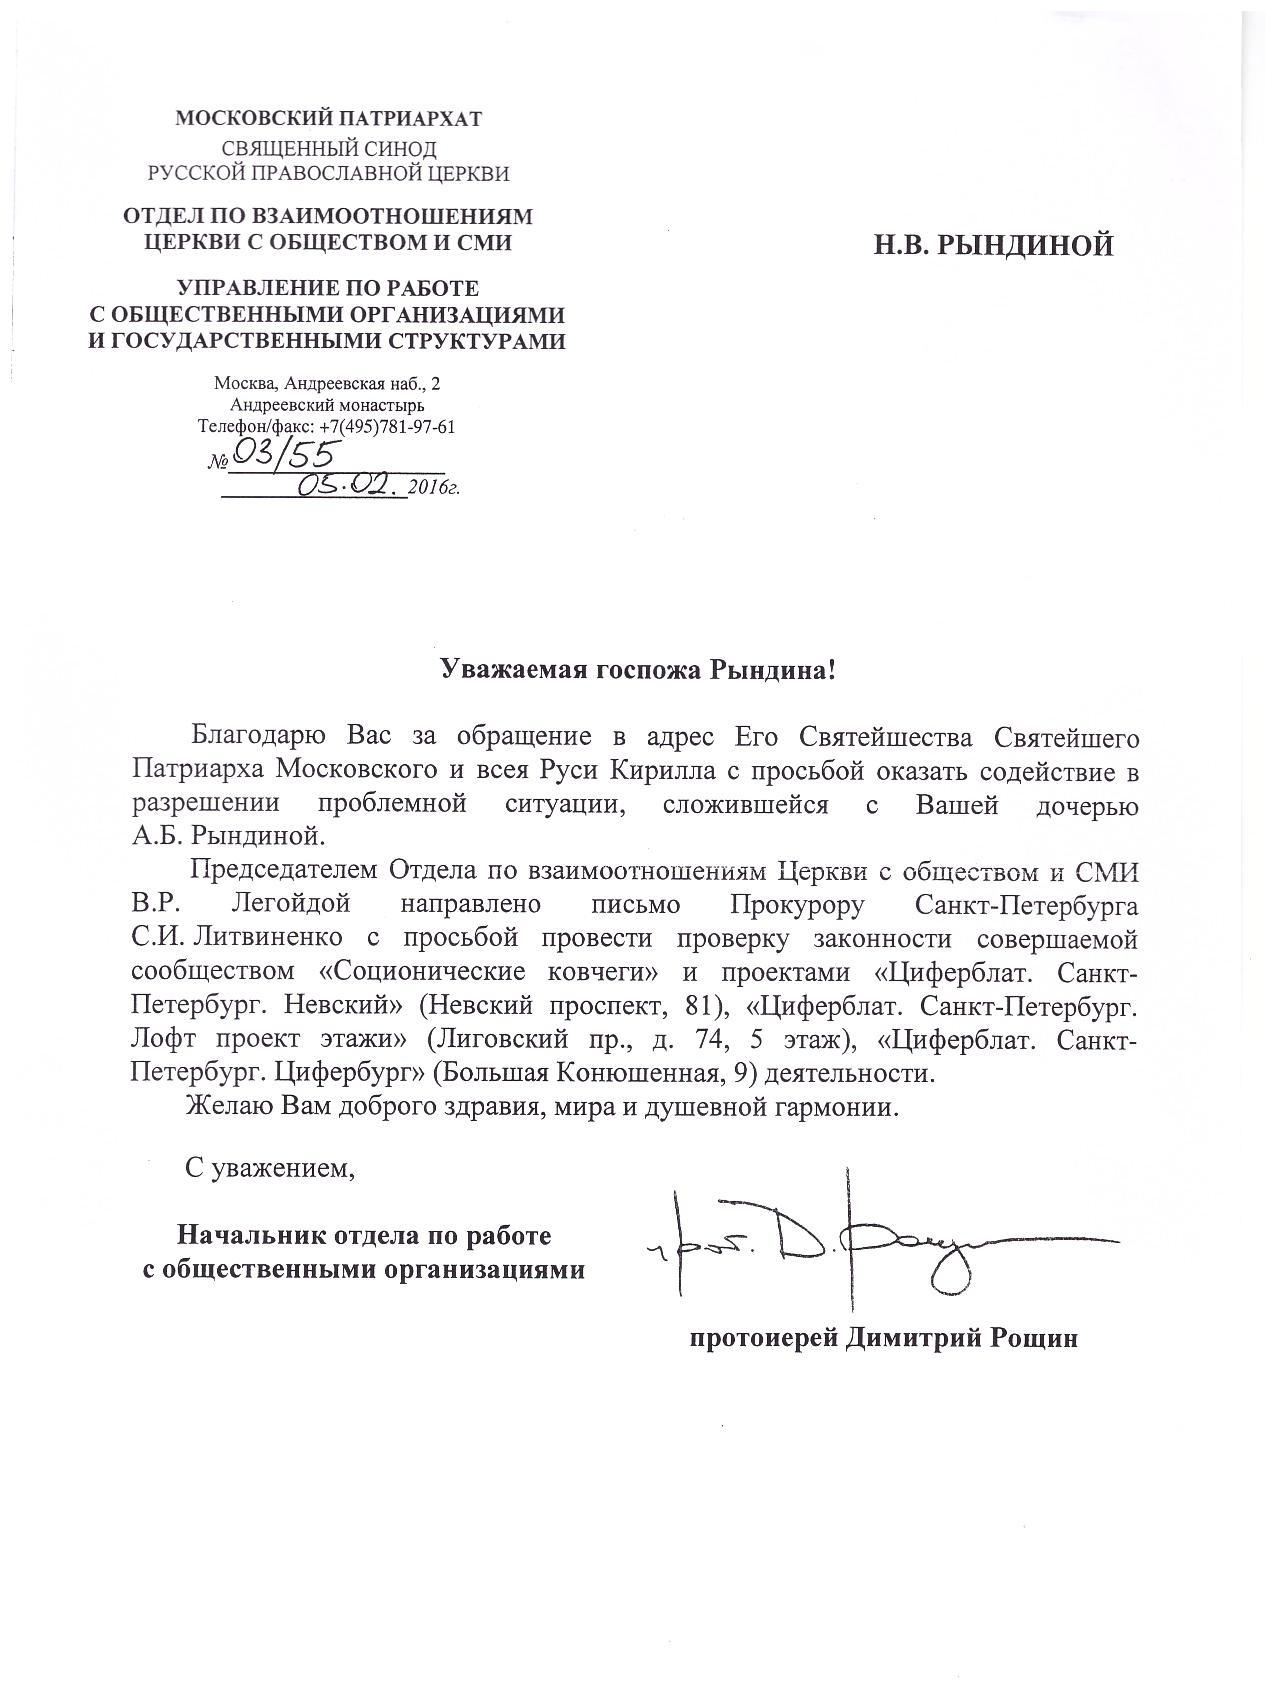 Запрос Московского Патриархата Литвиненко.jpg